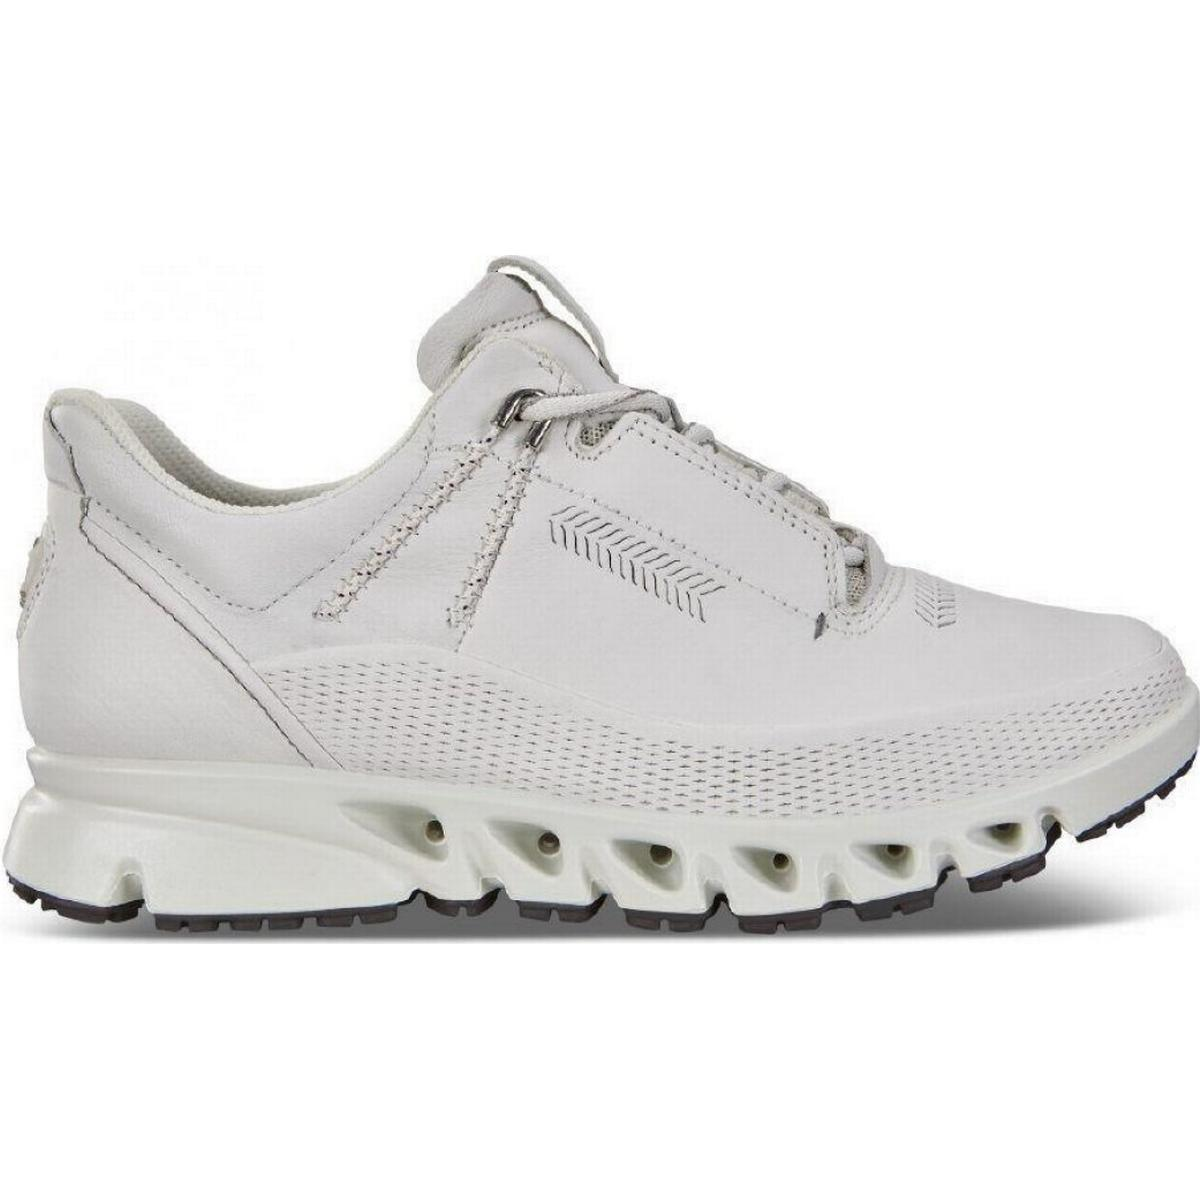 Ecco dam sneakers • Hitta det lägsta priset hos PriceRunner nu »